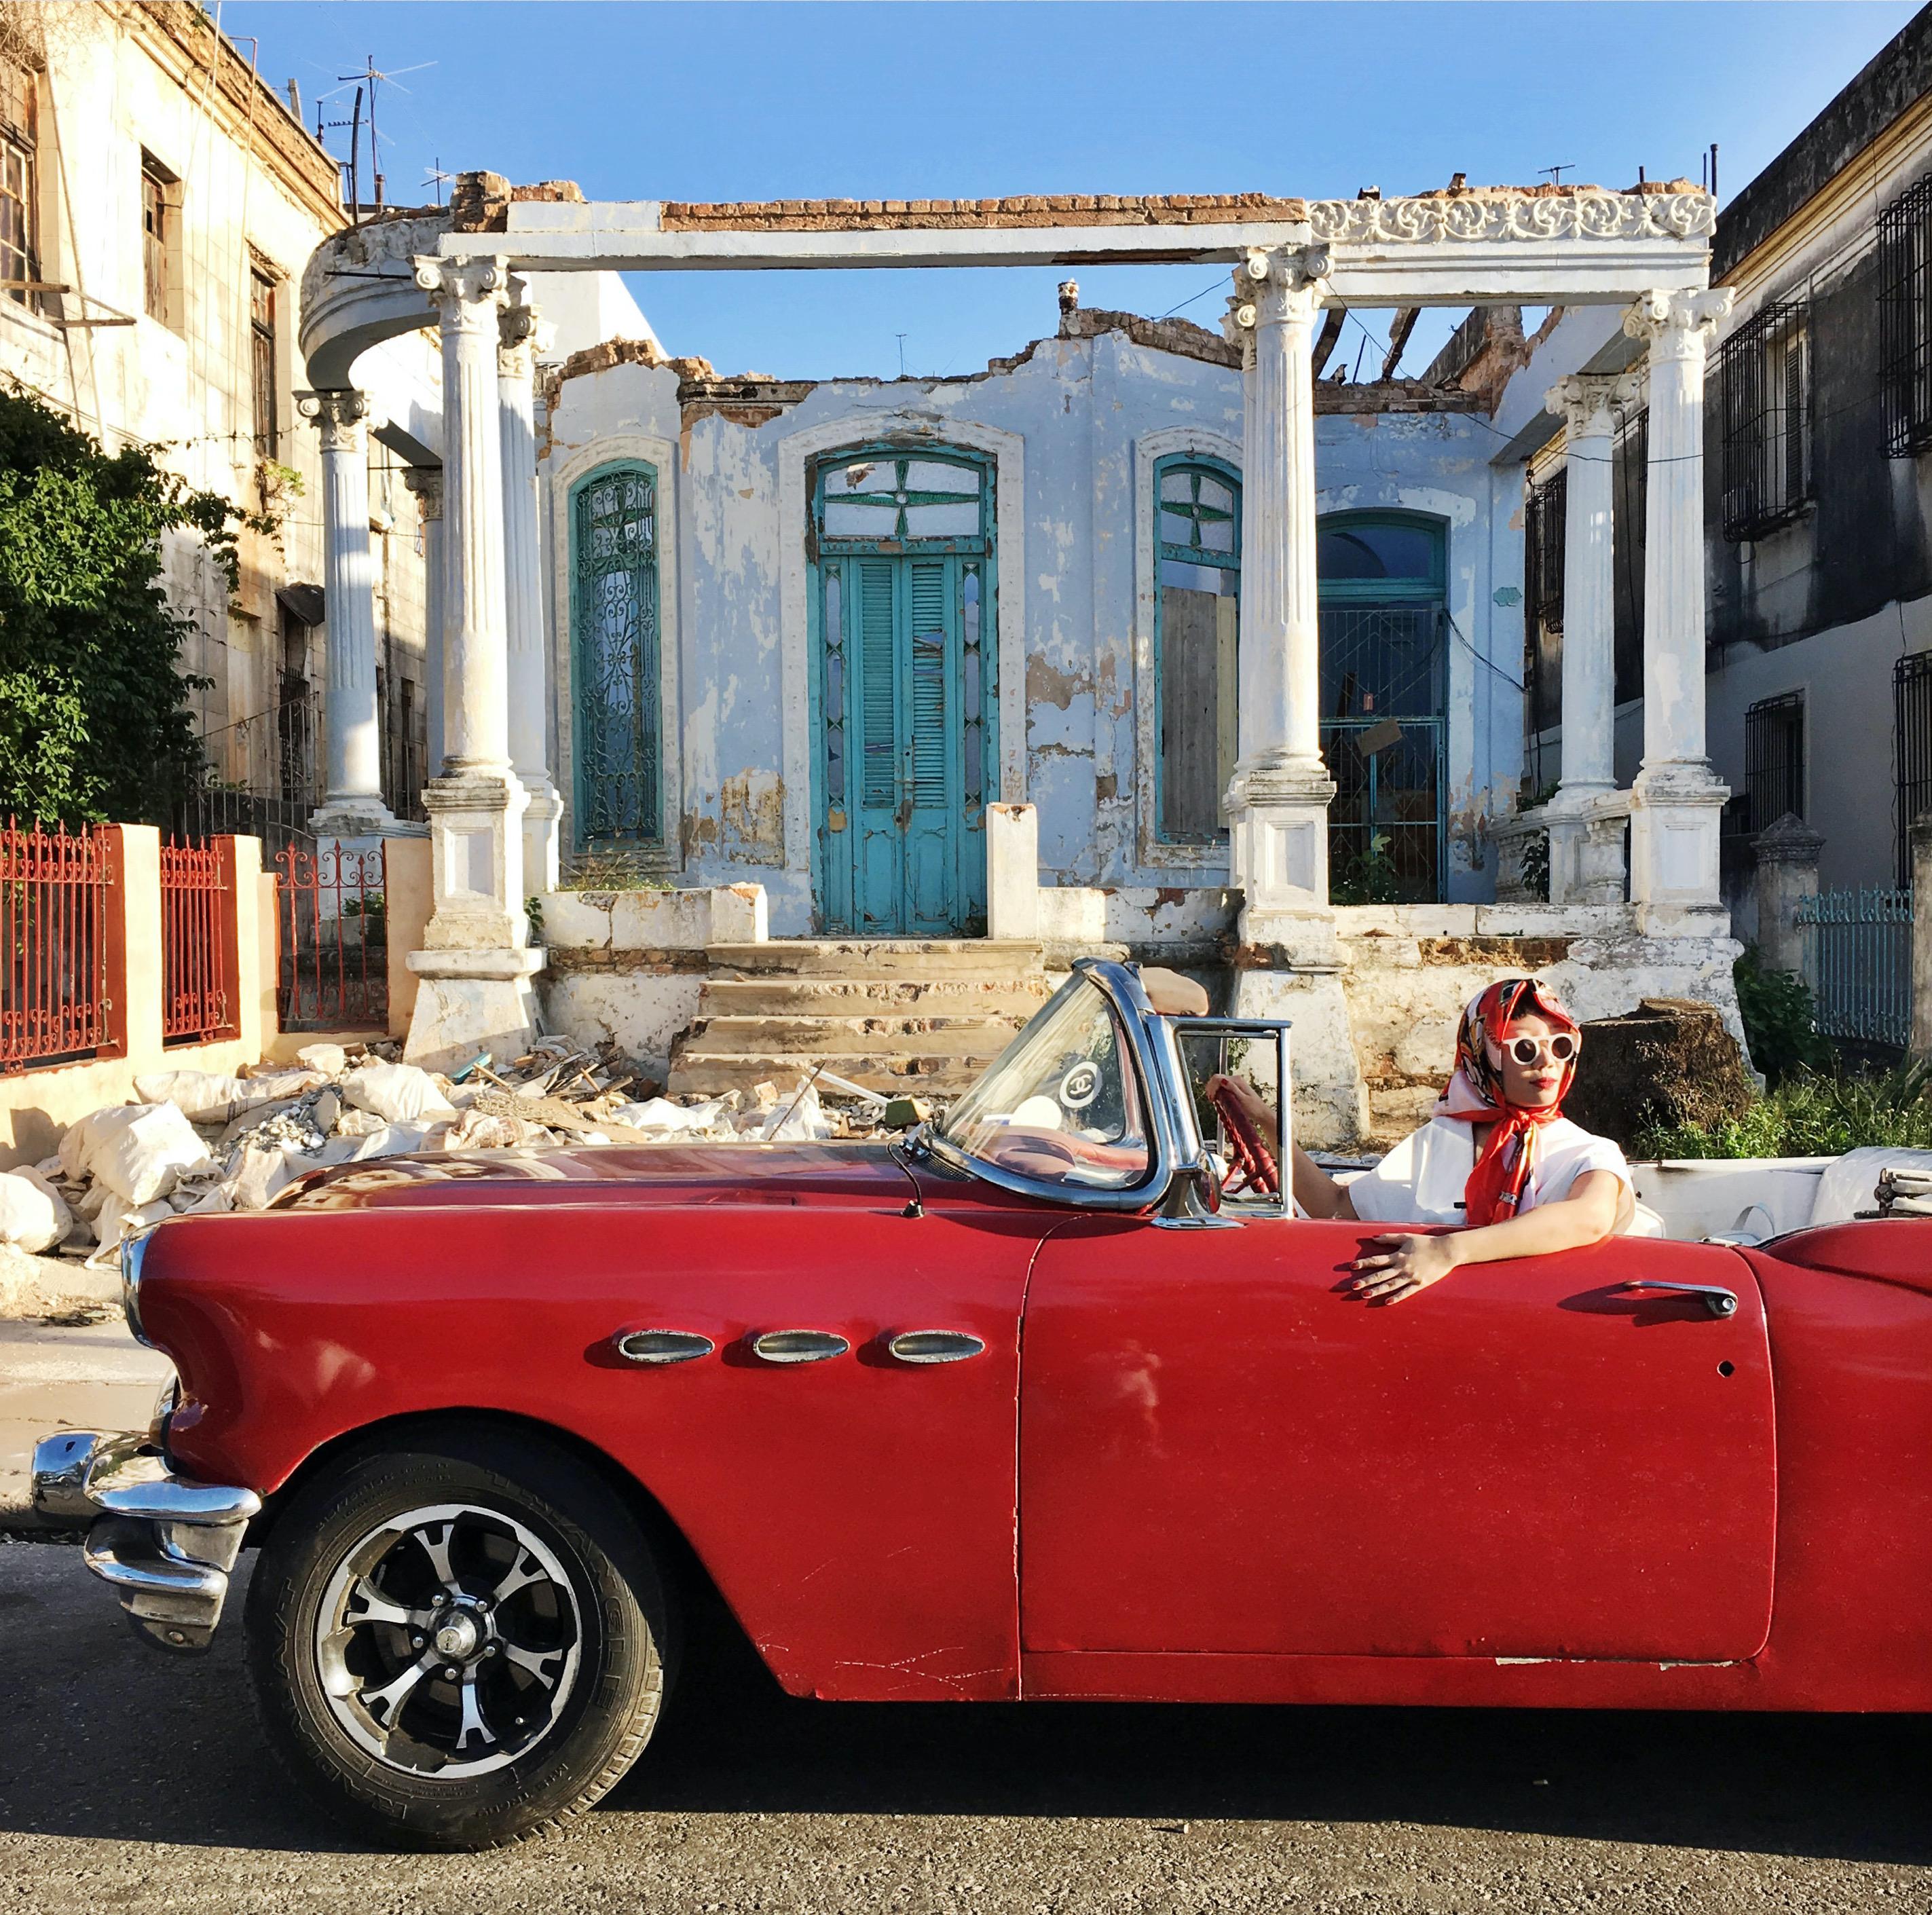 JiaJia Fei in Havana, Cuba for her 30th birthday, 2017